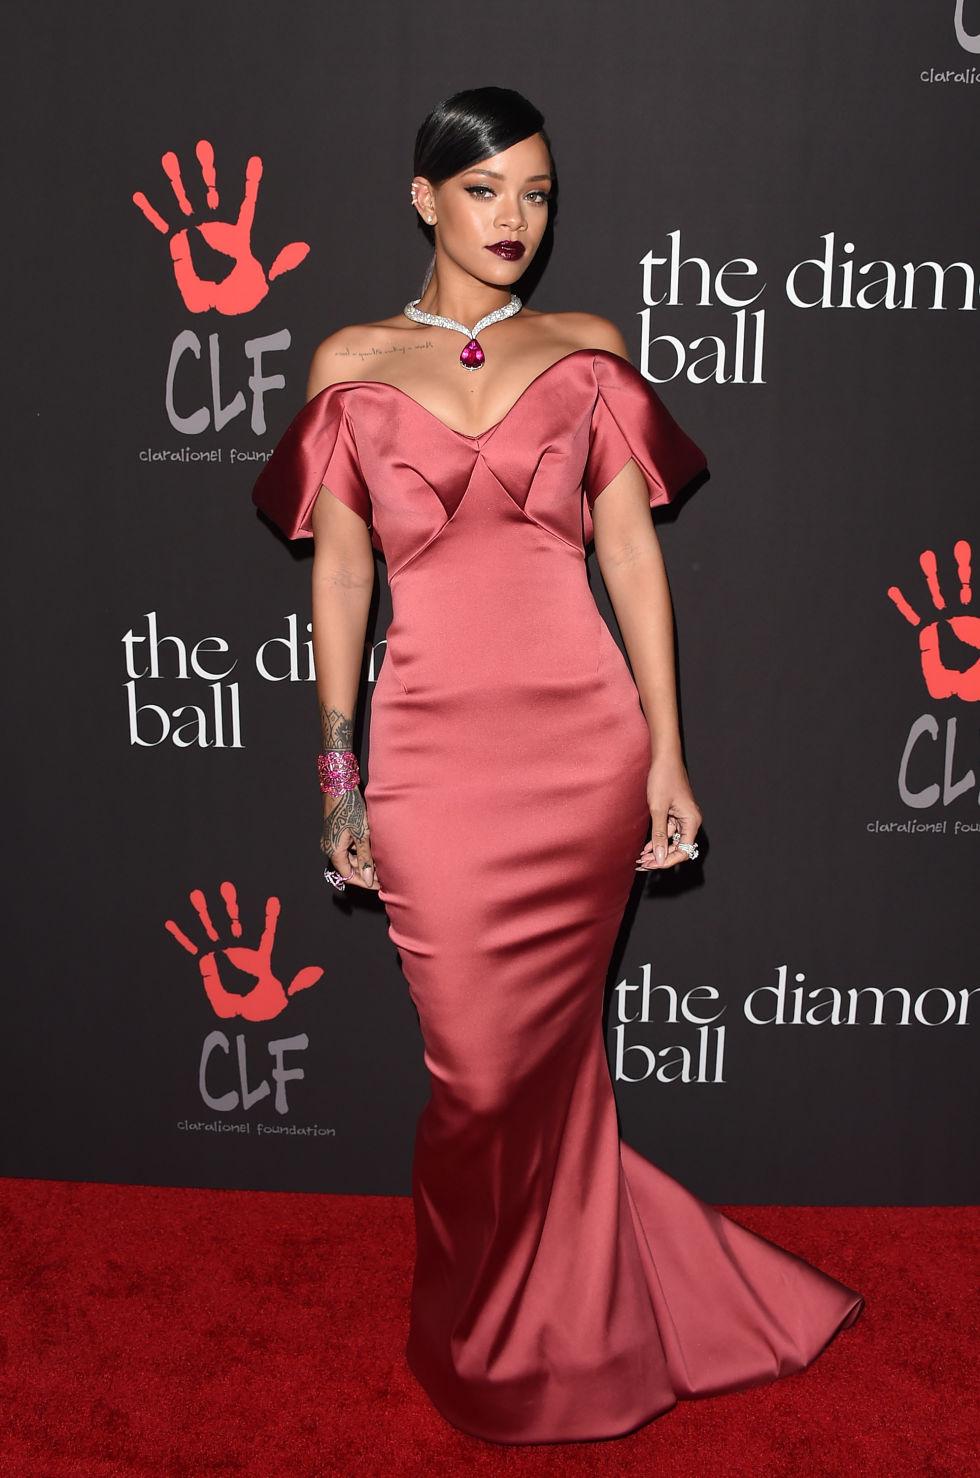 Rihanna Met Gala Red Carpet Photos - Rihanna Red Carpet Fashion Photos